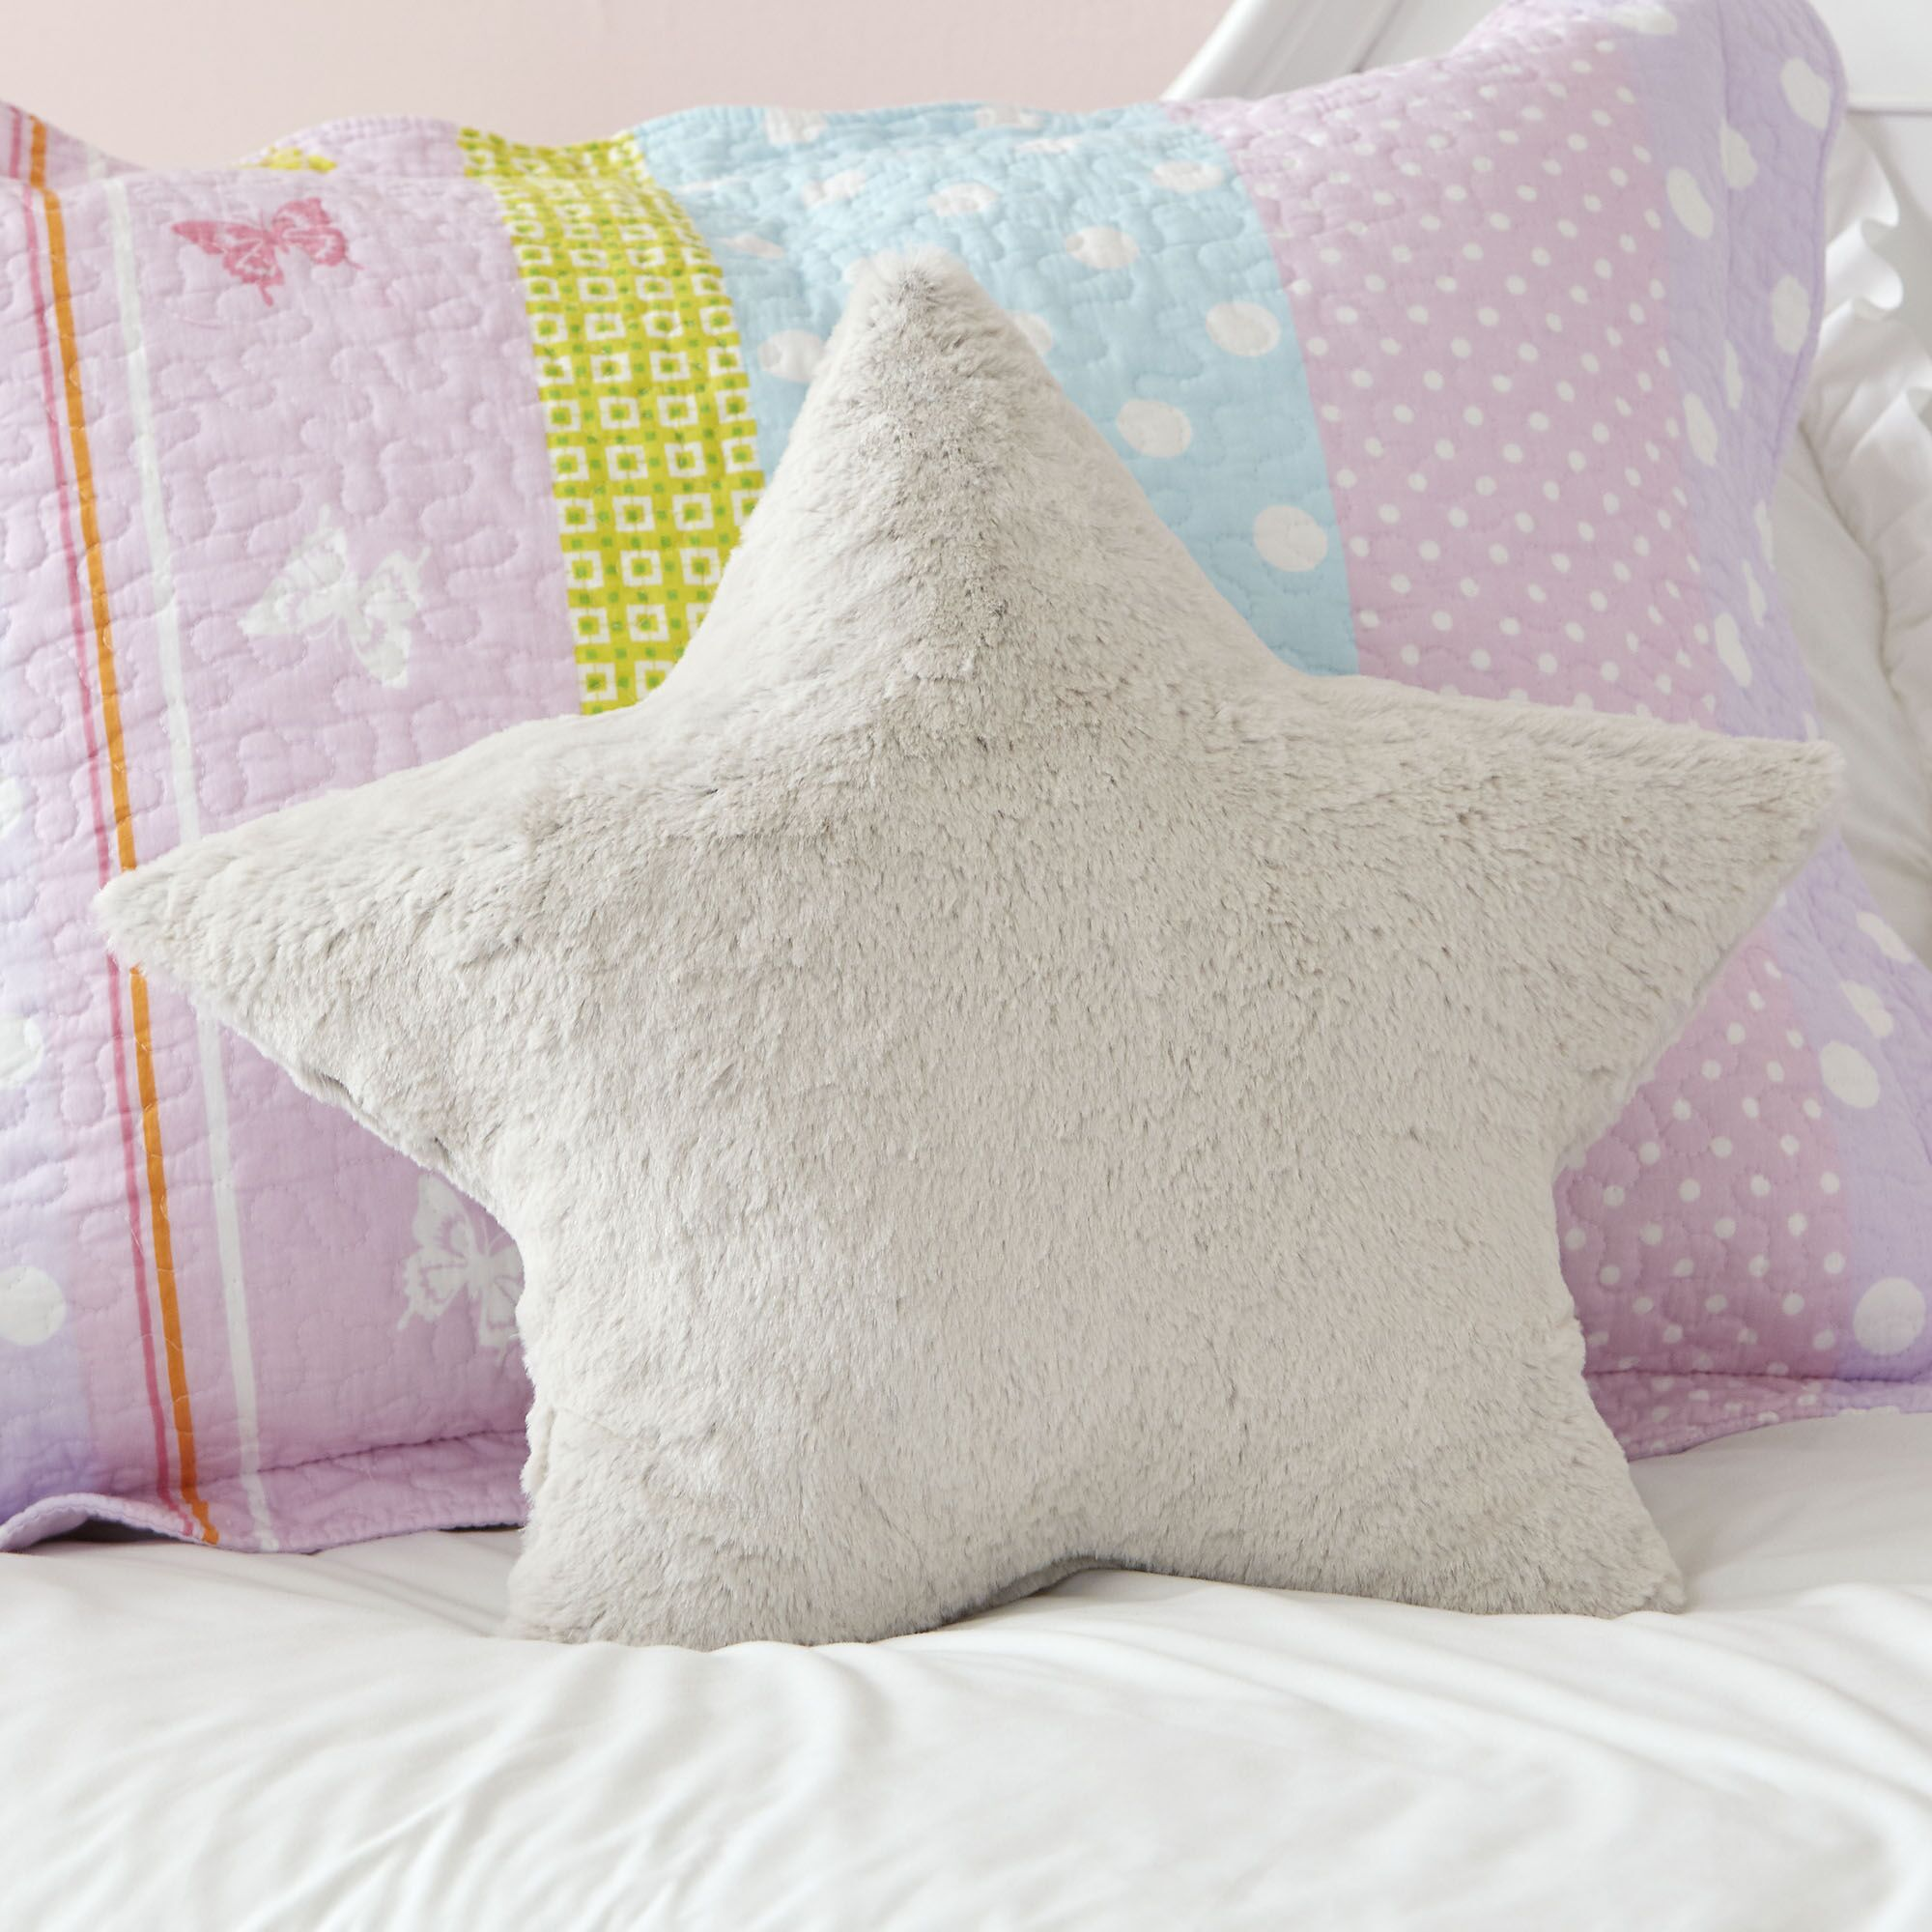 Plush Star Pillow